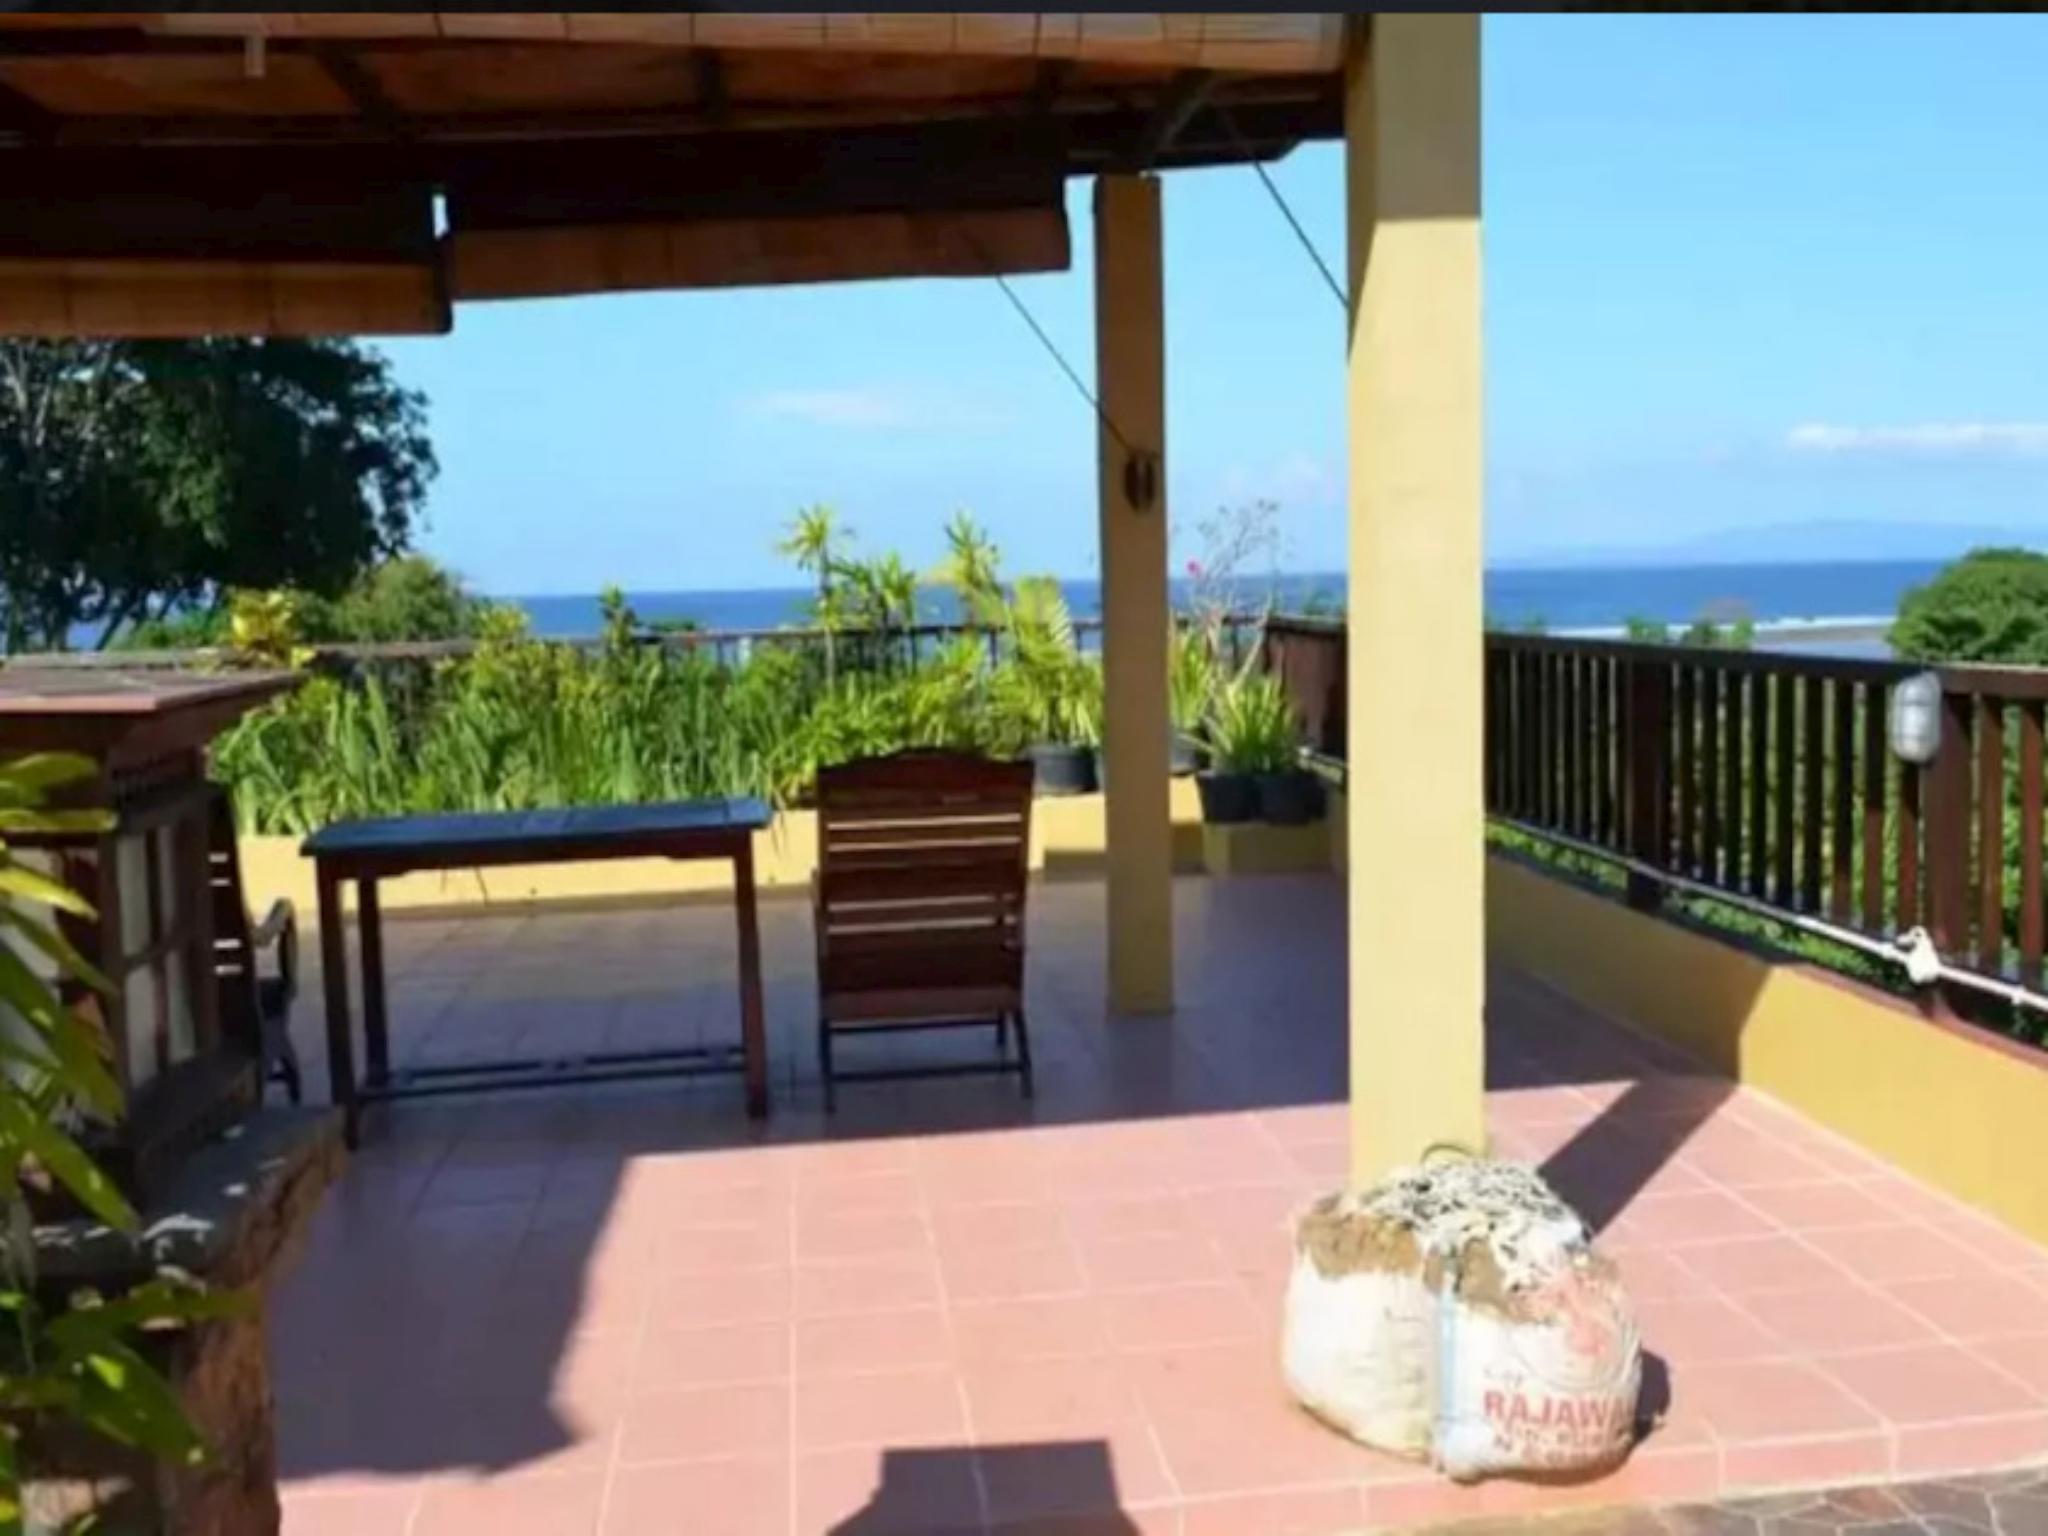 Budget Hotel Room at Sanur Beach